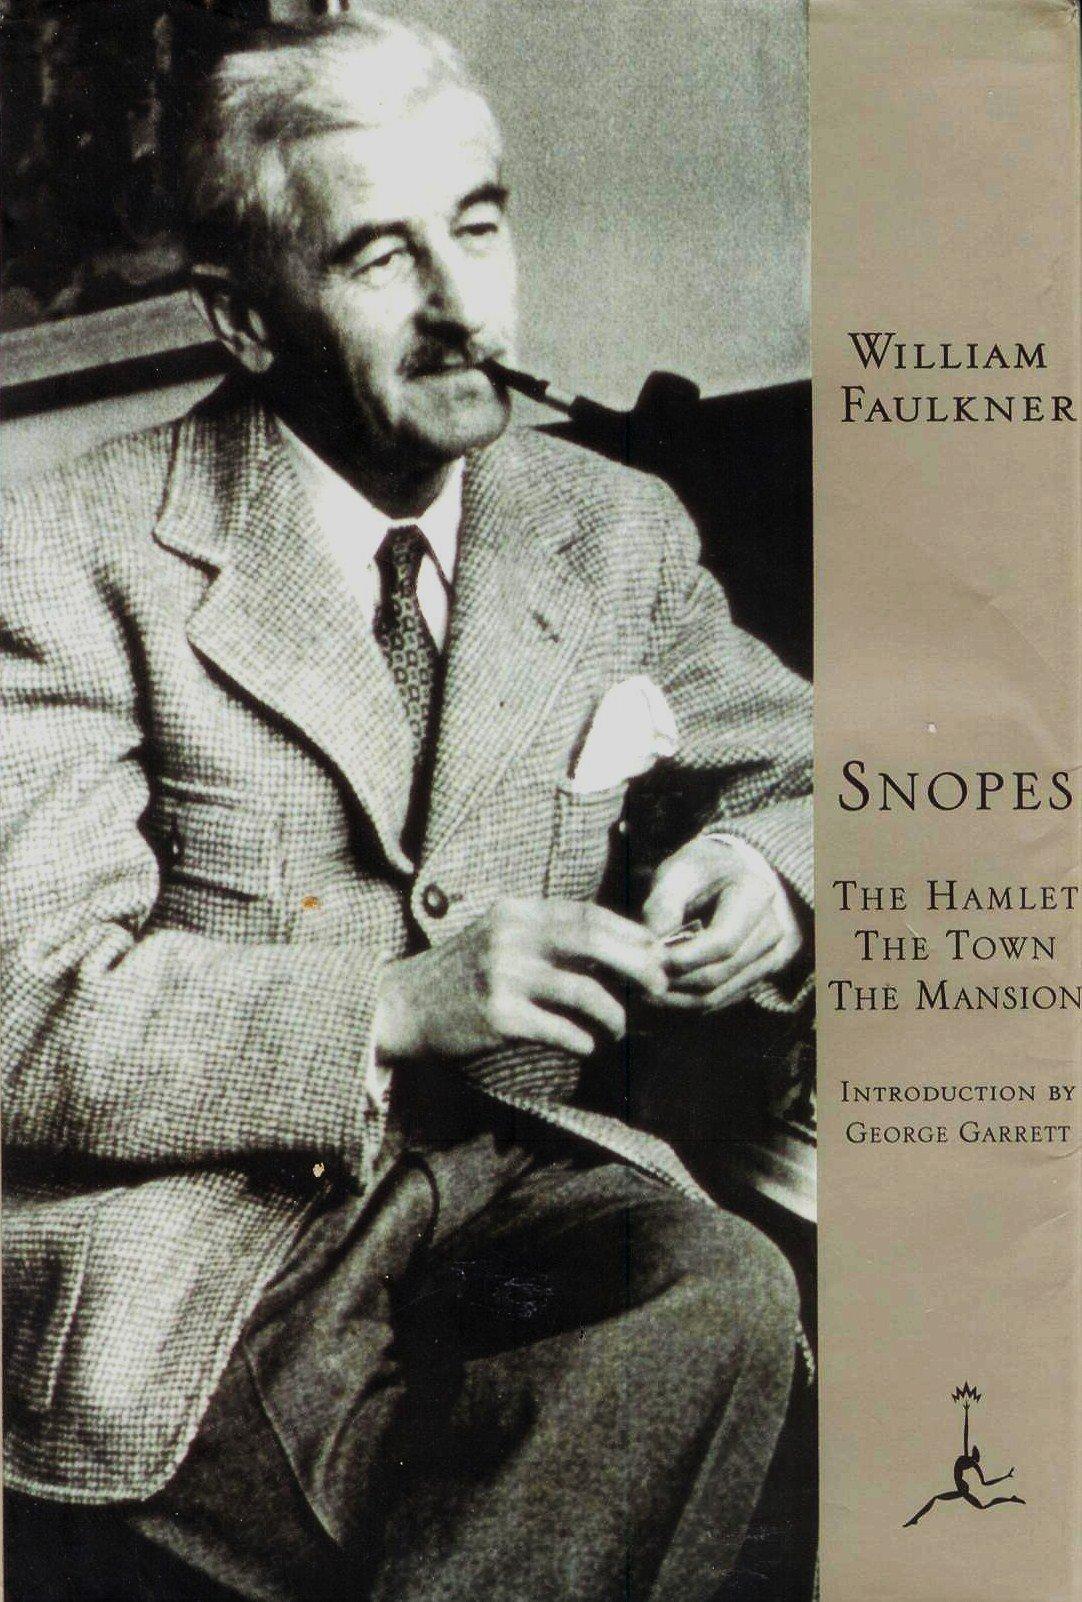 Snopes: A Trilogy (Snopes Trilogy): William Faulkner, George